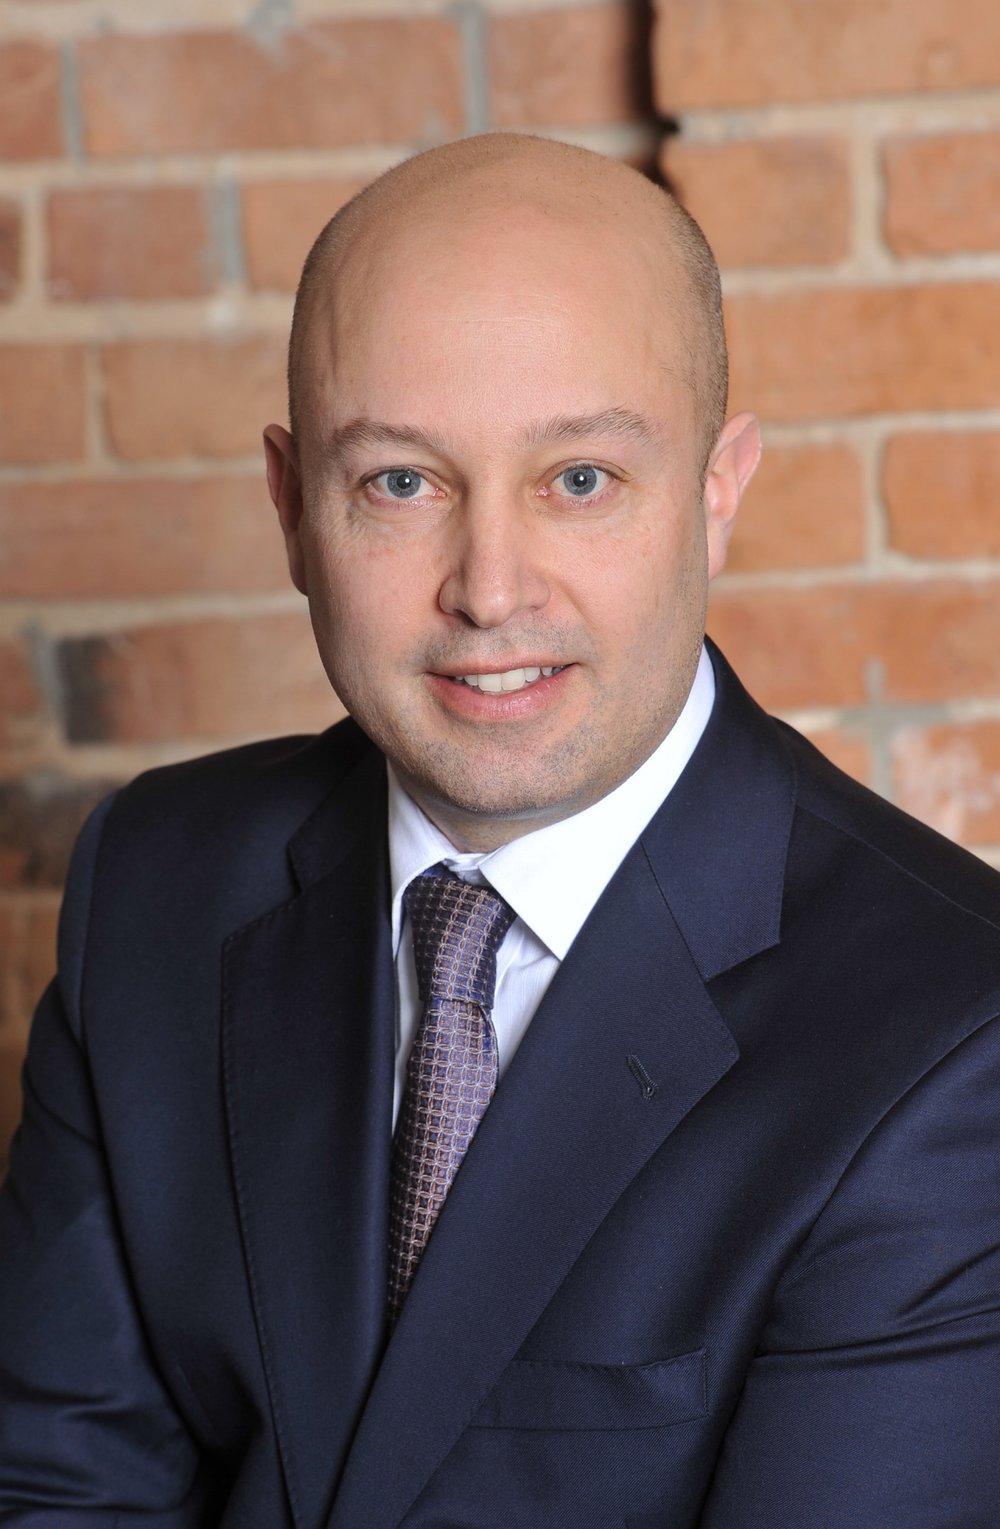 Trevor Arsenault, VP of Business Development and Alliance Management